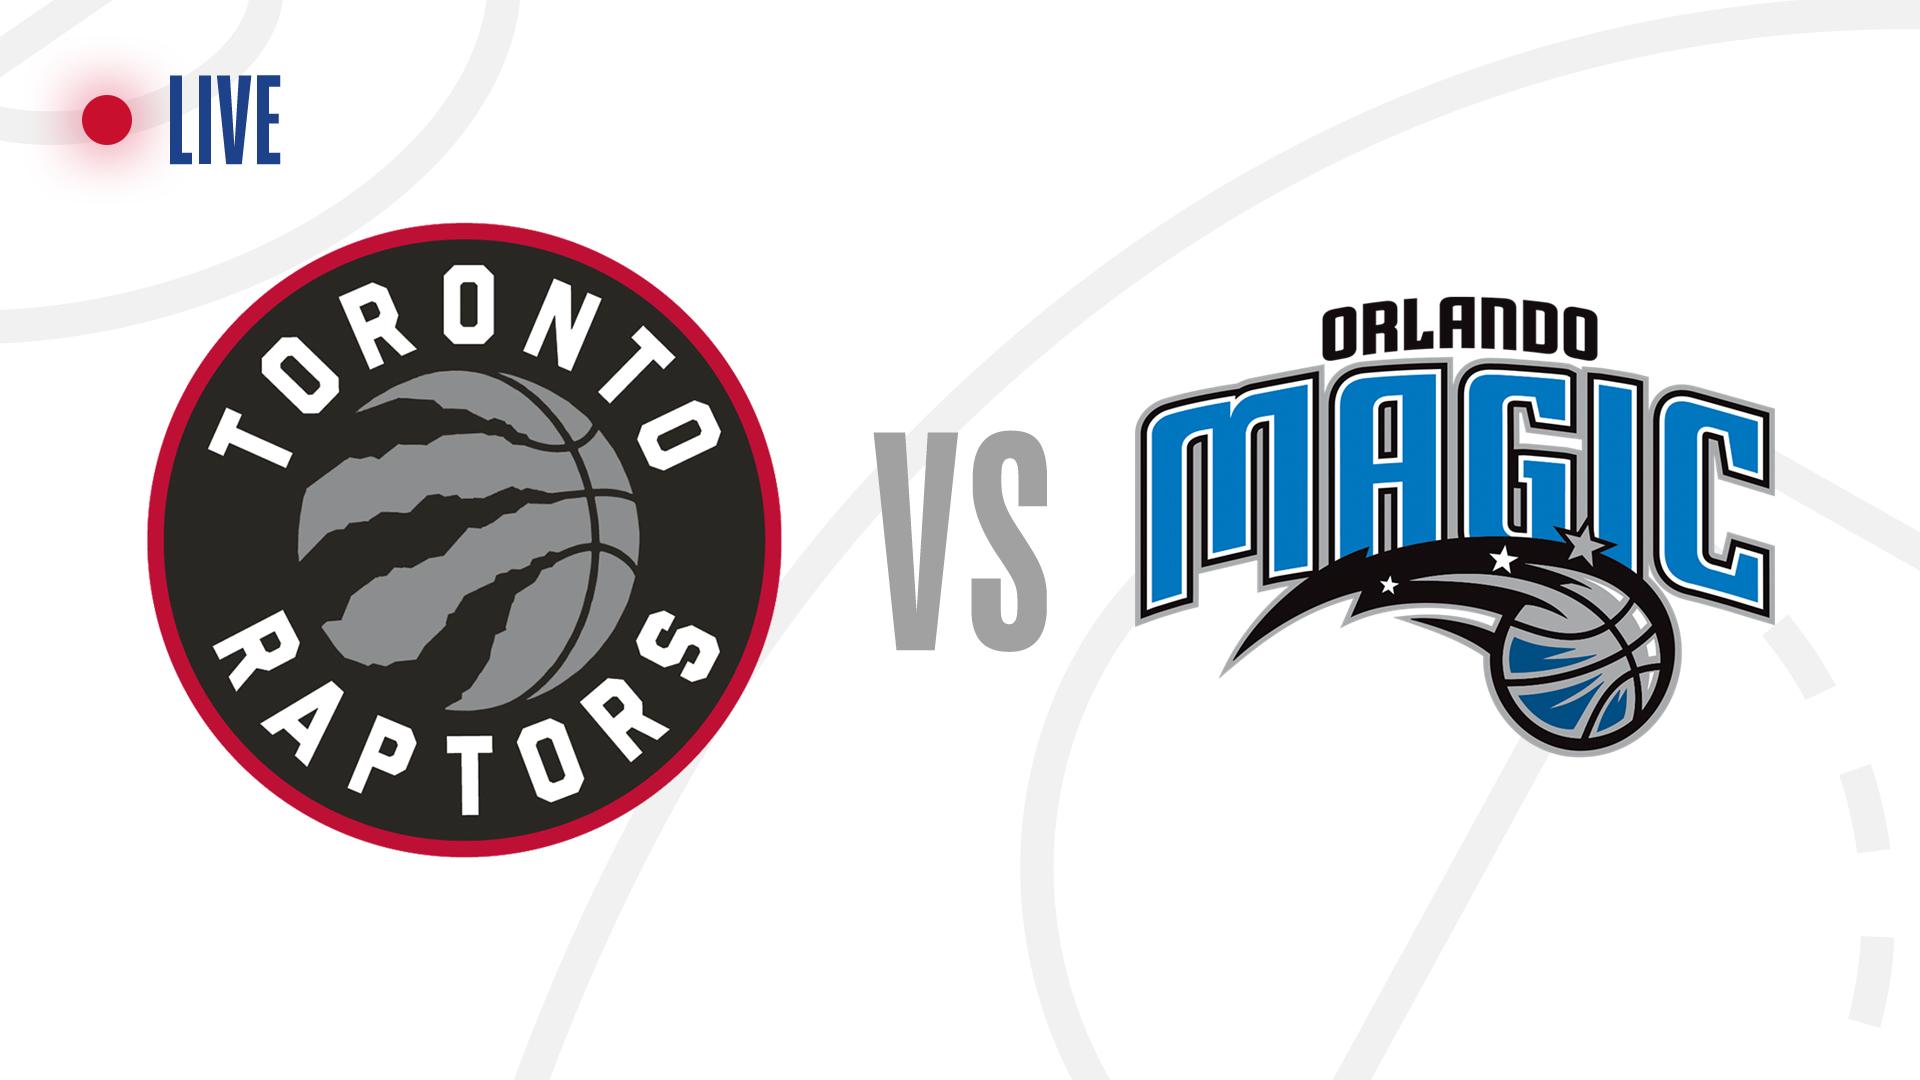 Nba Playoffs 2019 Toronto Raptors Vs Orlando Magic Live